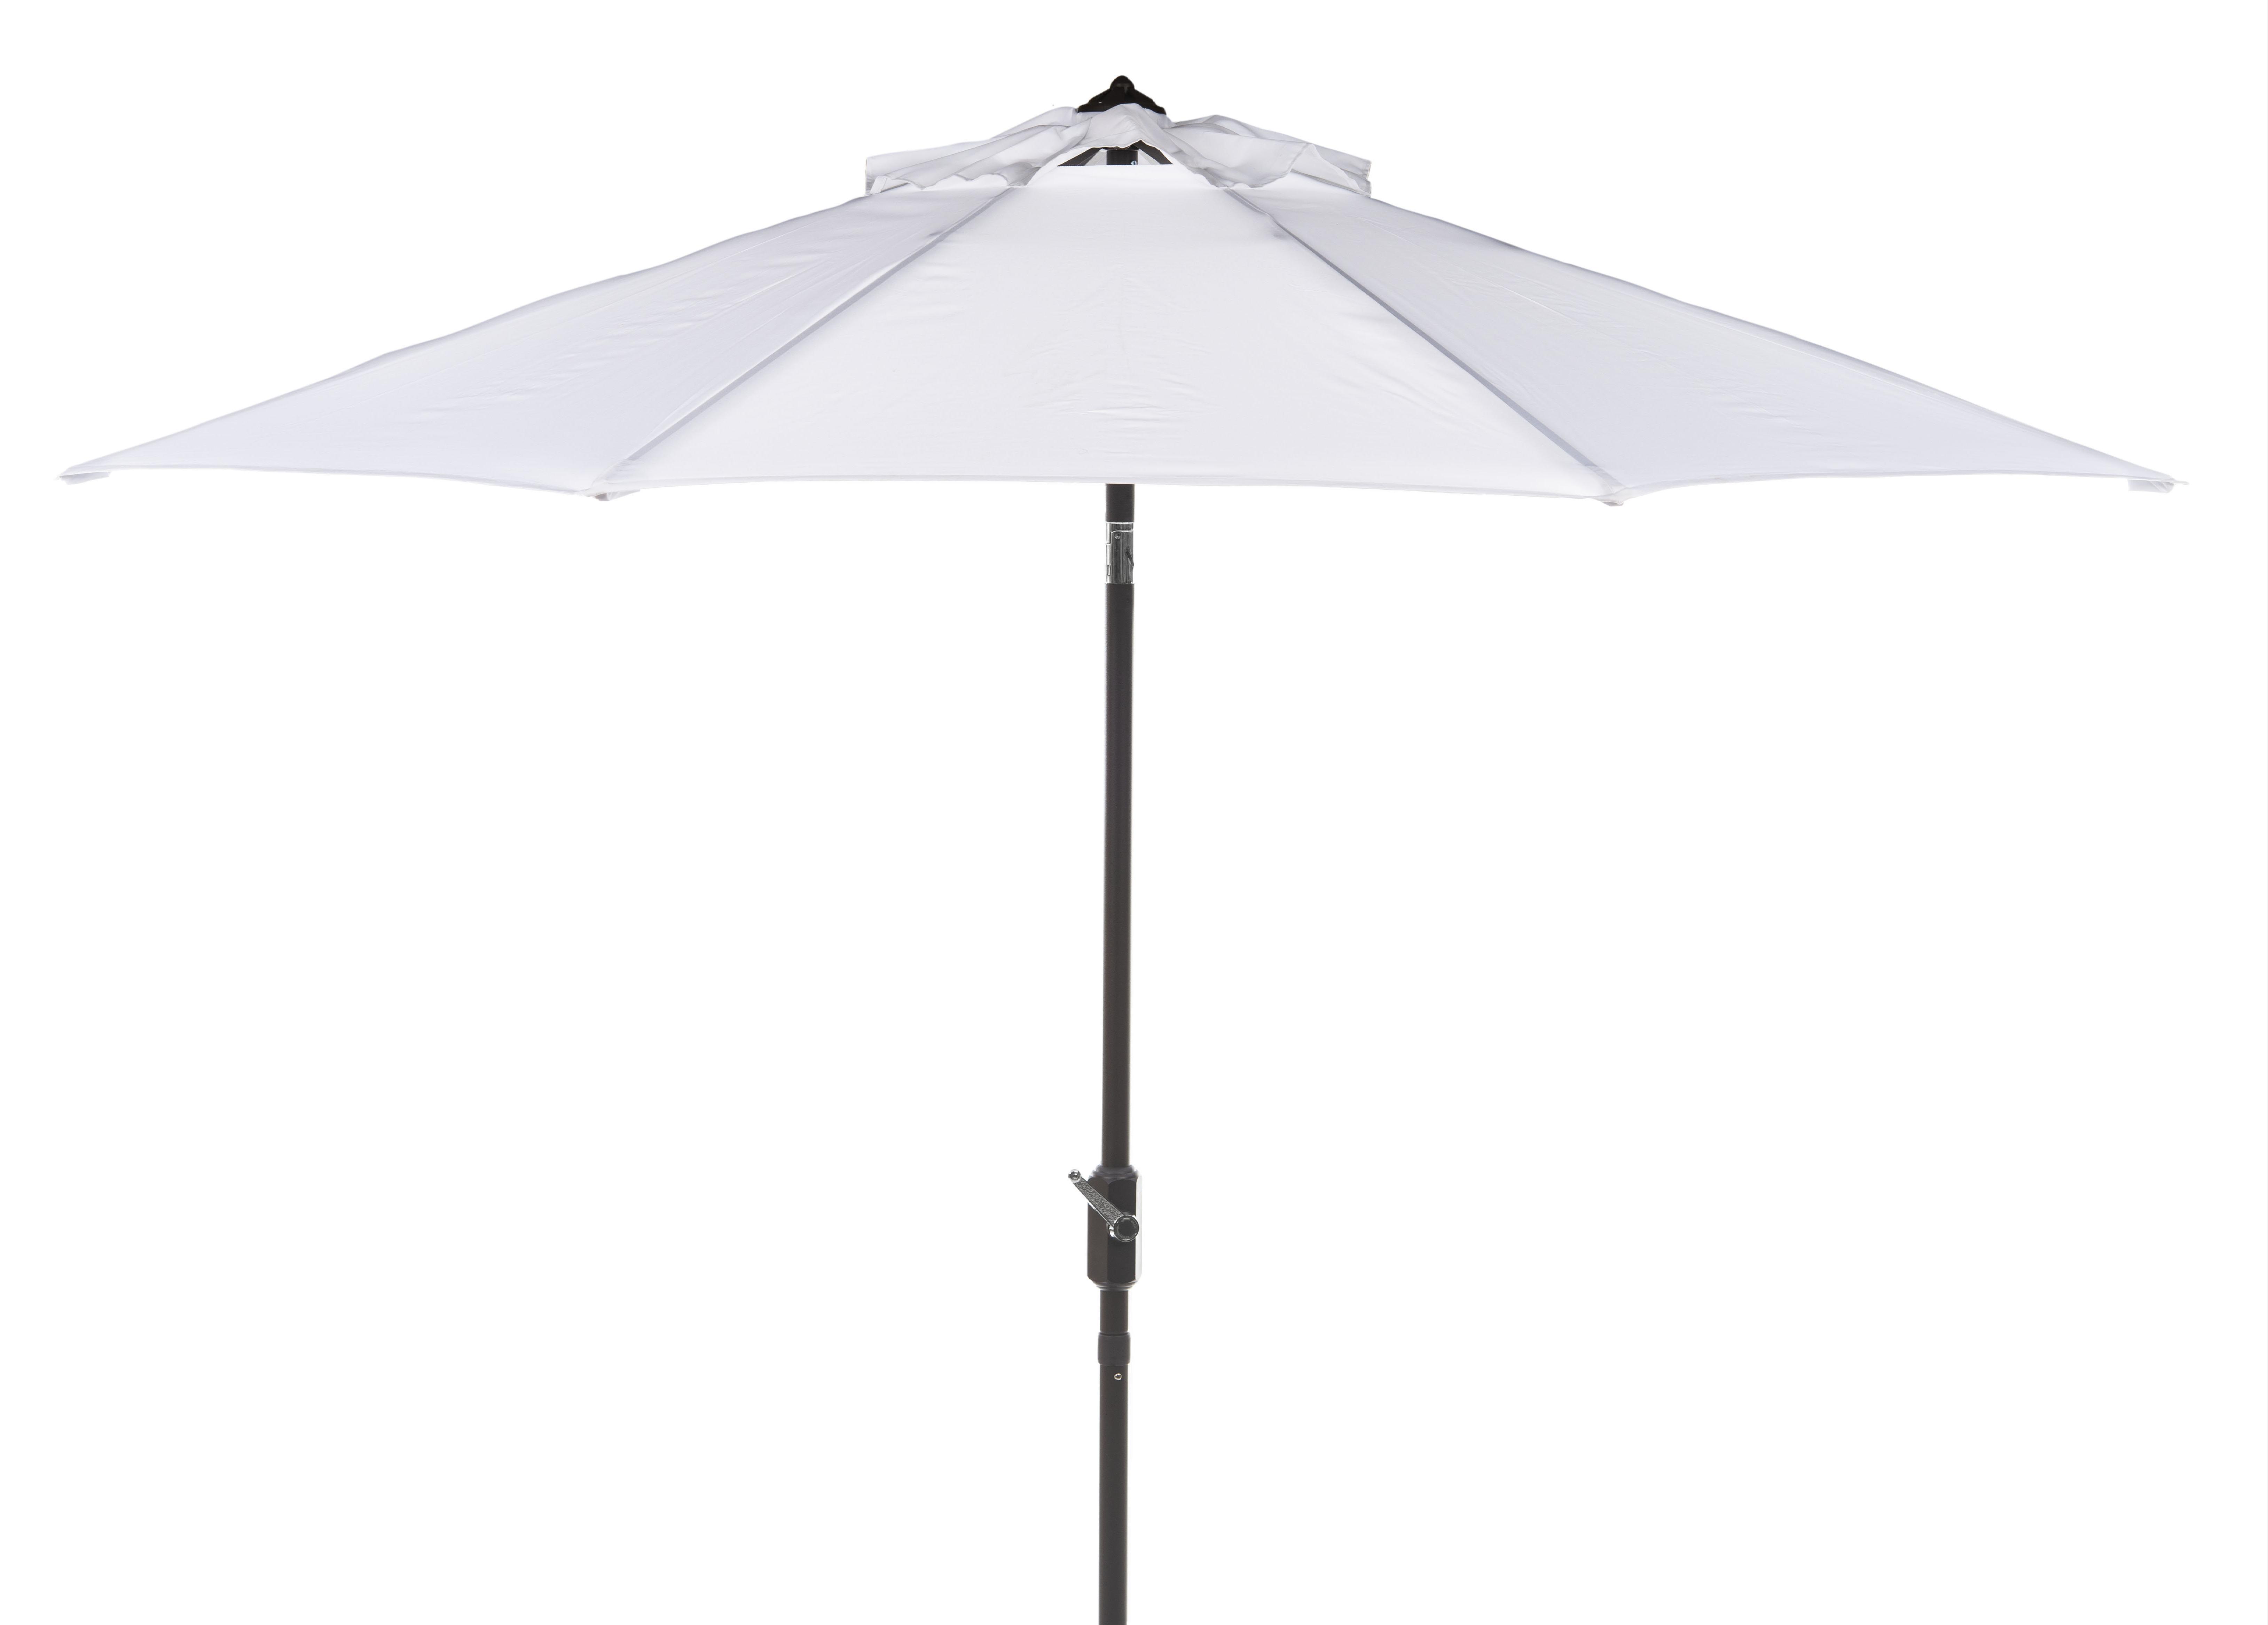 2020 Mraz Market Umbrellas Intended For Belles 9 Market Umbrella (View 17 of 20)